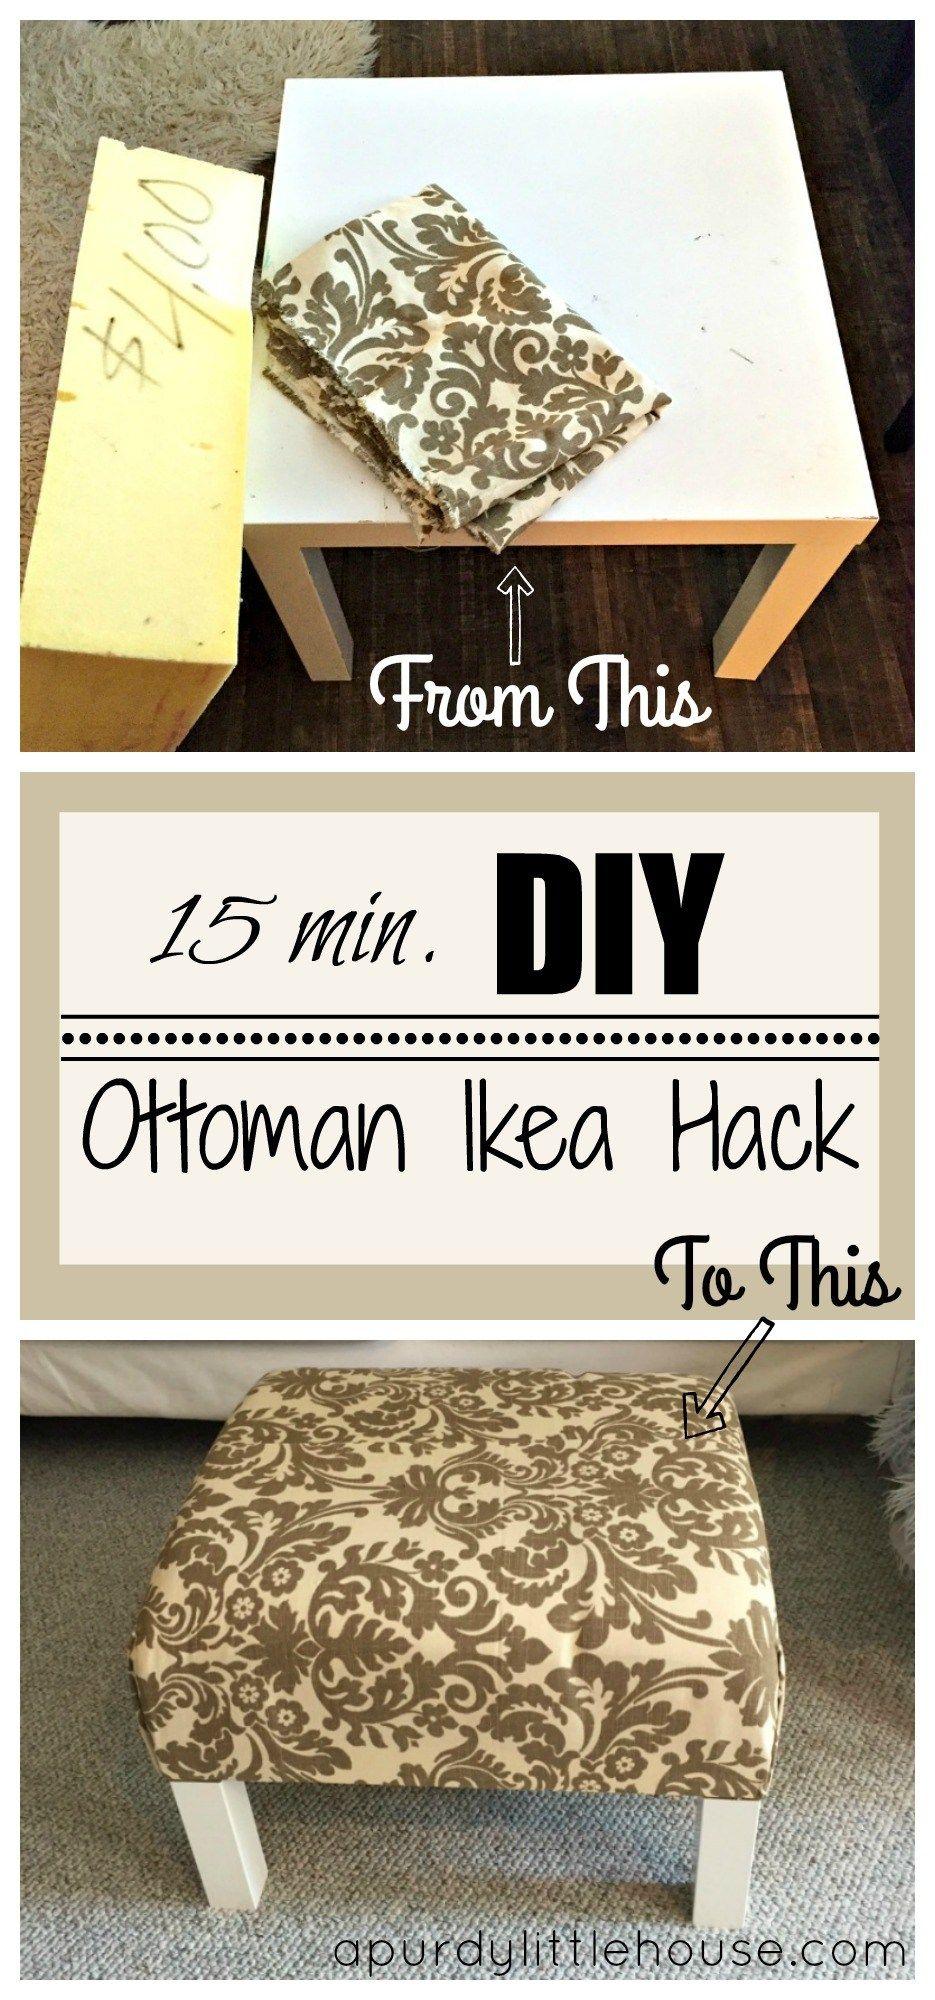 Diy Ottoman Coffee Table Ikea Hack A Purdy Little House Diy Ottoman Diy Ottoman Coffee Table Coffee Table Ikea Hack [ 2000 x 935 Pixel ]